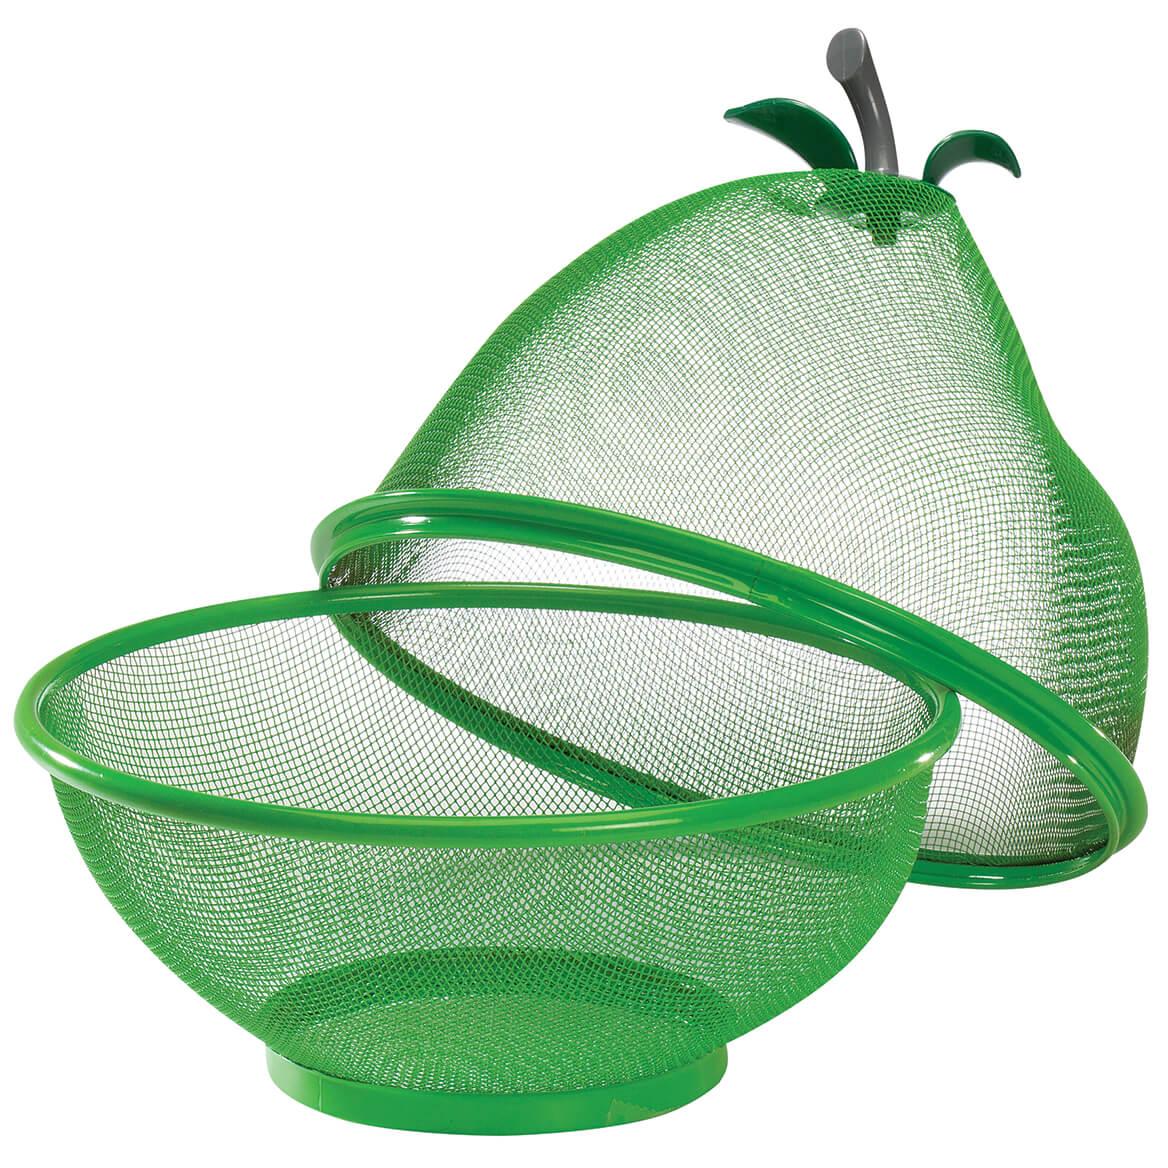 Pear Shaped Fruit Basket-371129